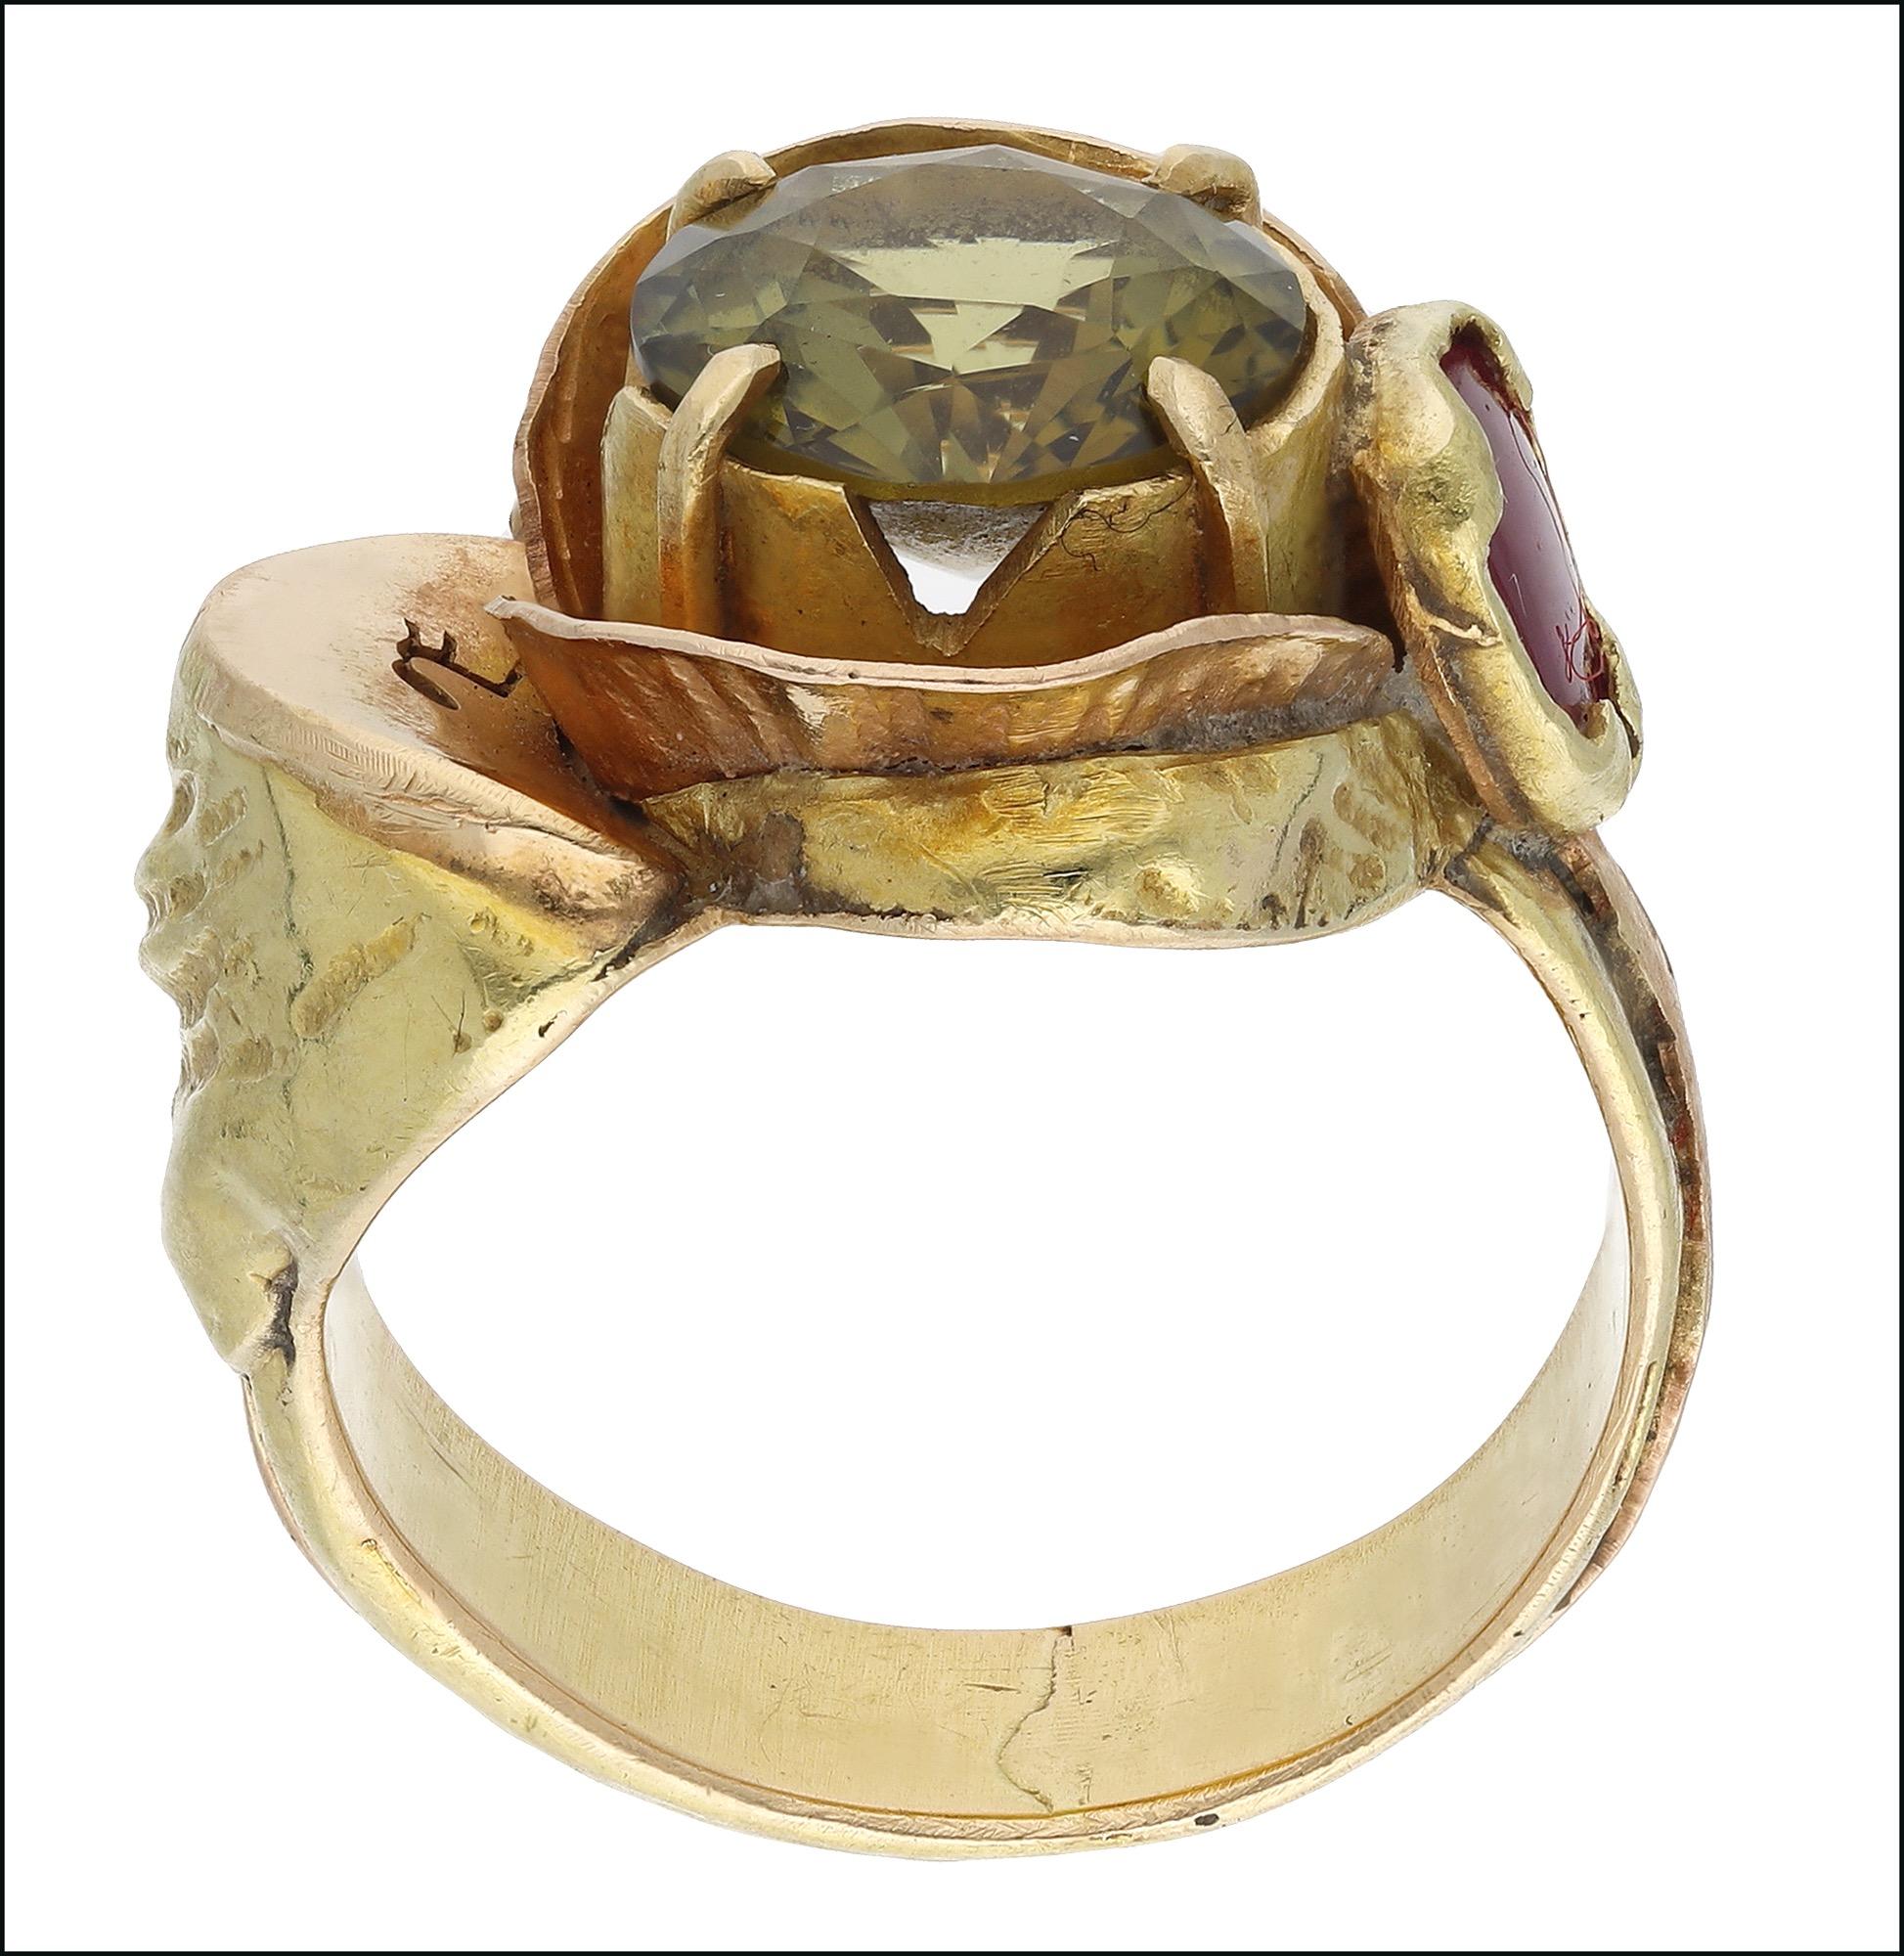 Jewellery - Image 3 of 4